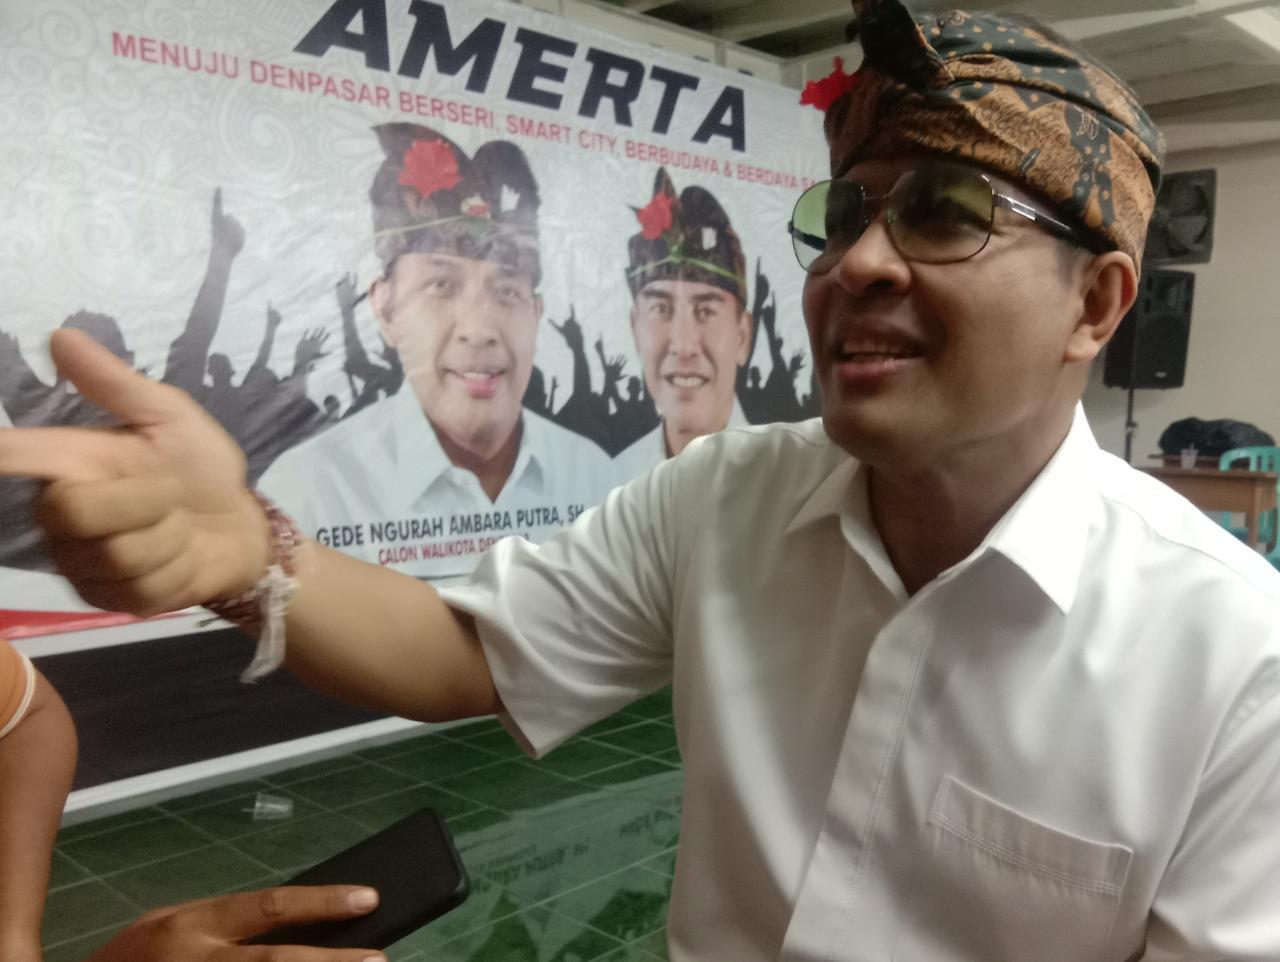 Gede Ngurah Ambara Putra. Foto: alt